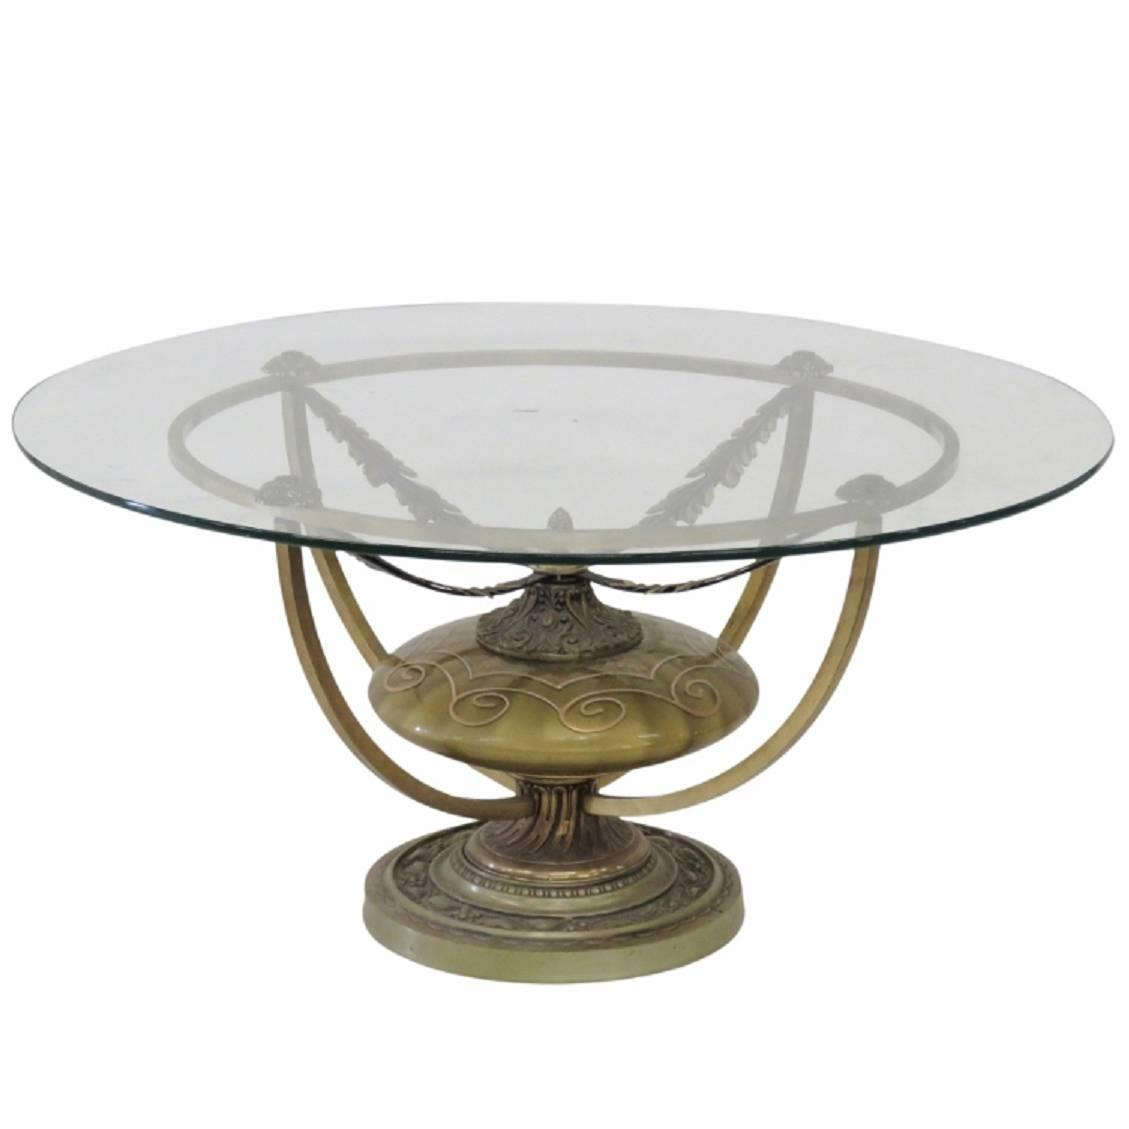 Round Mid Century Modern Coffee Table: Mid-Century Modern Round Urn Base Glass Top Coffee Table